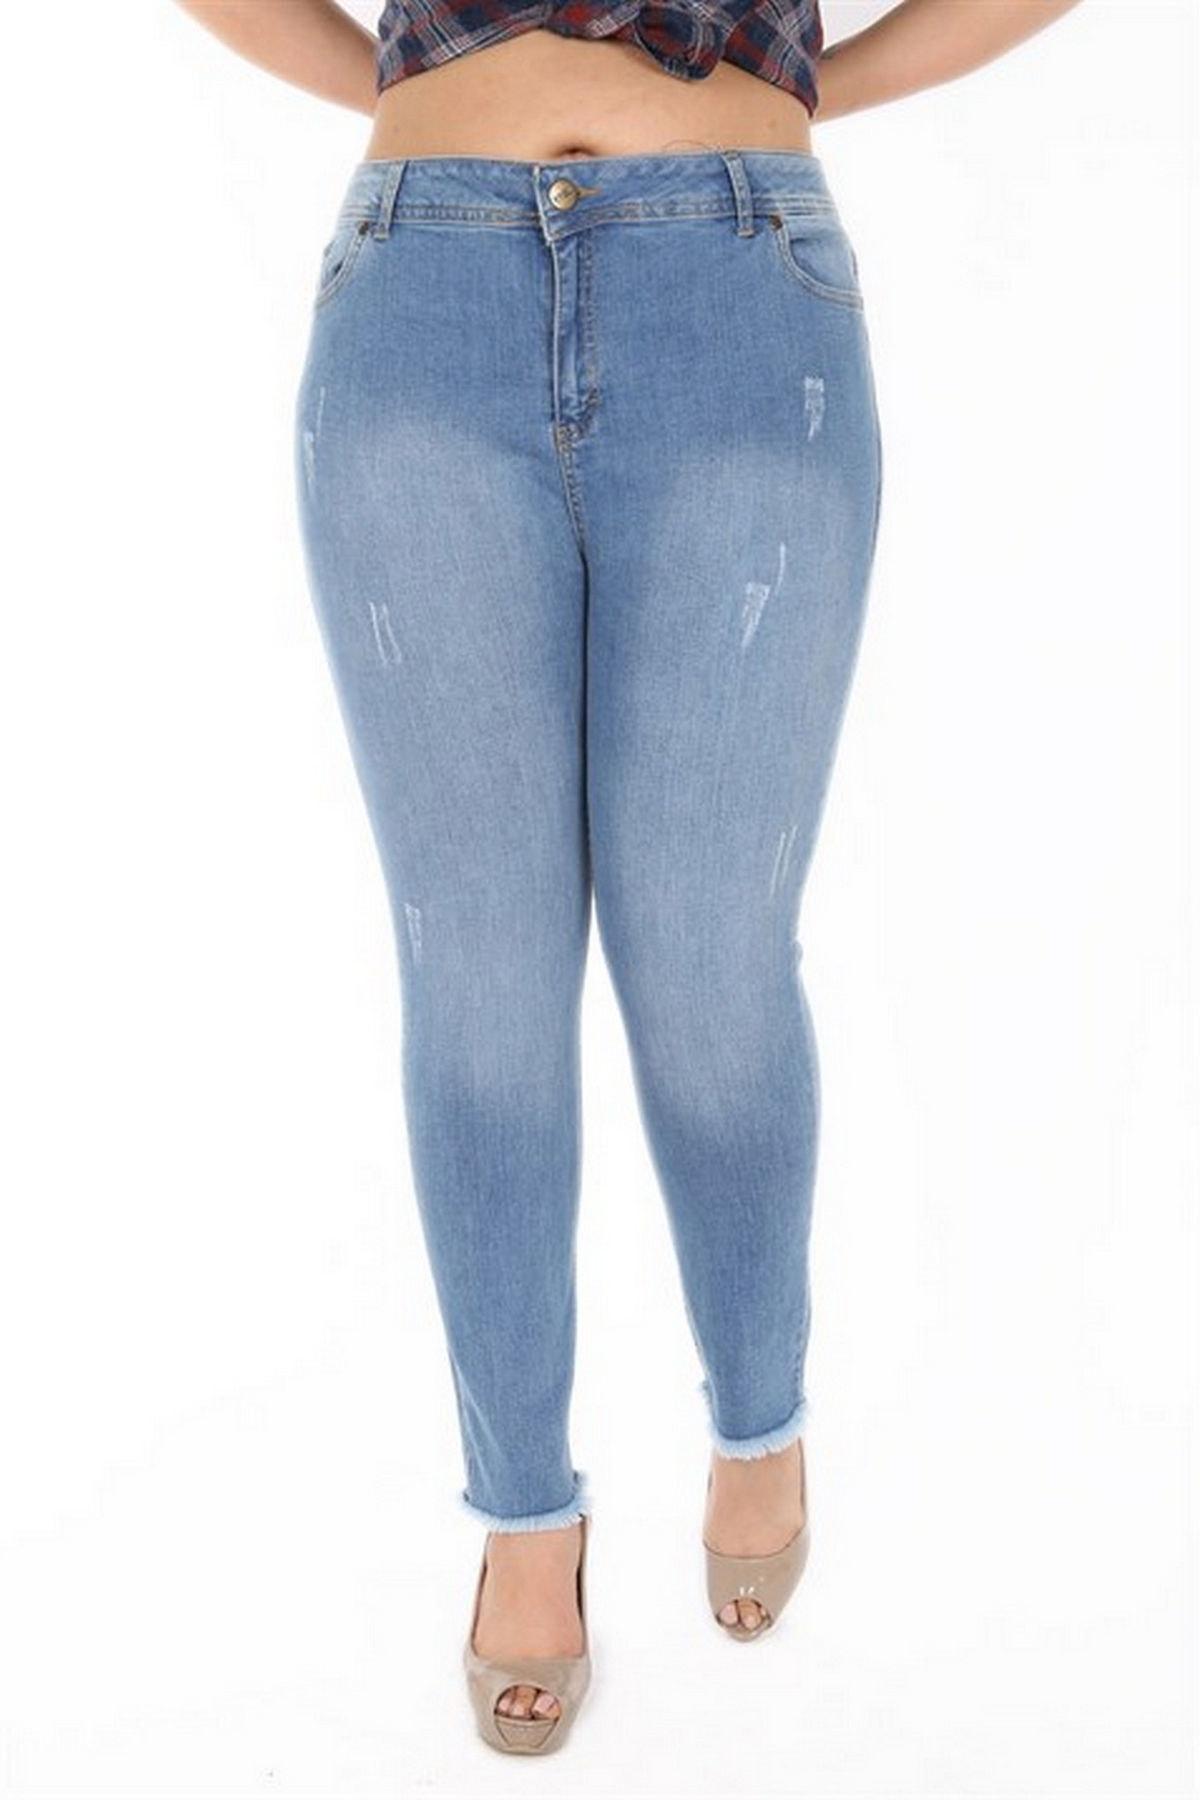 Kadın Mavi Kot Yüksek Bel Dar Paça Pantolon Rg1288